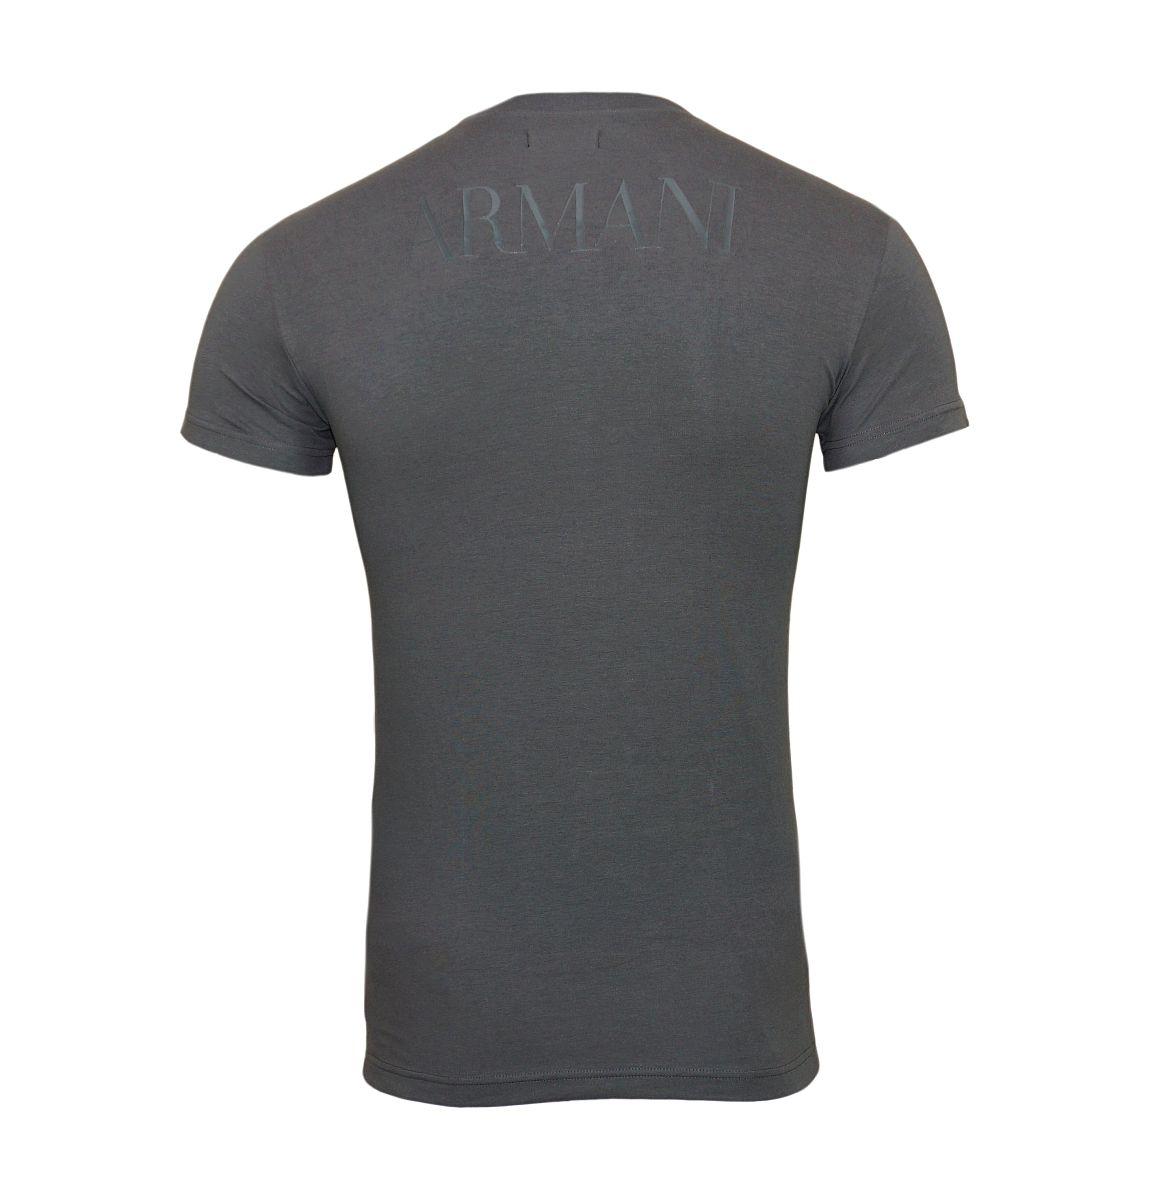 Emporio Armani T-Shirt Rundhals 111035 8P516 00044 ANTRACITE W18-EATS1